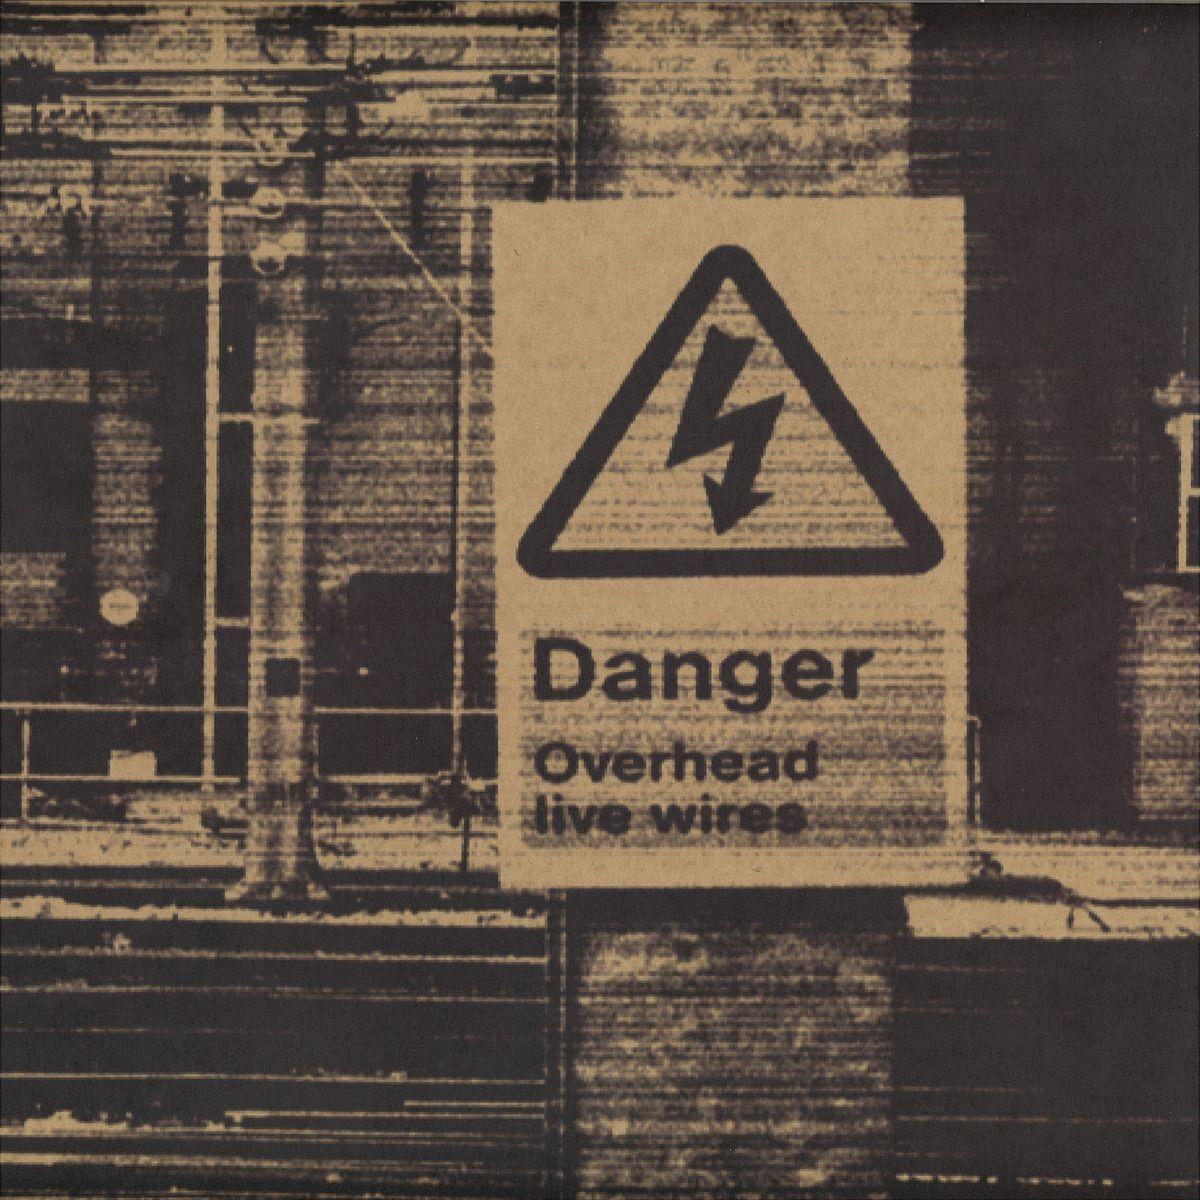 Cabarete Groove - Danger.Overhead Live Wires (Machine Box)